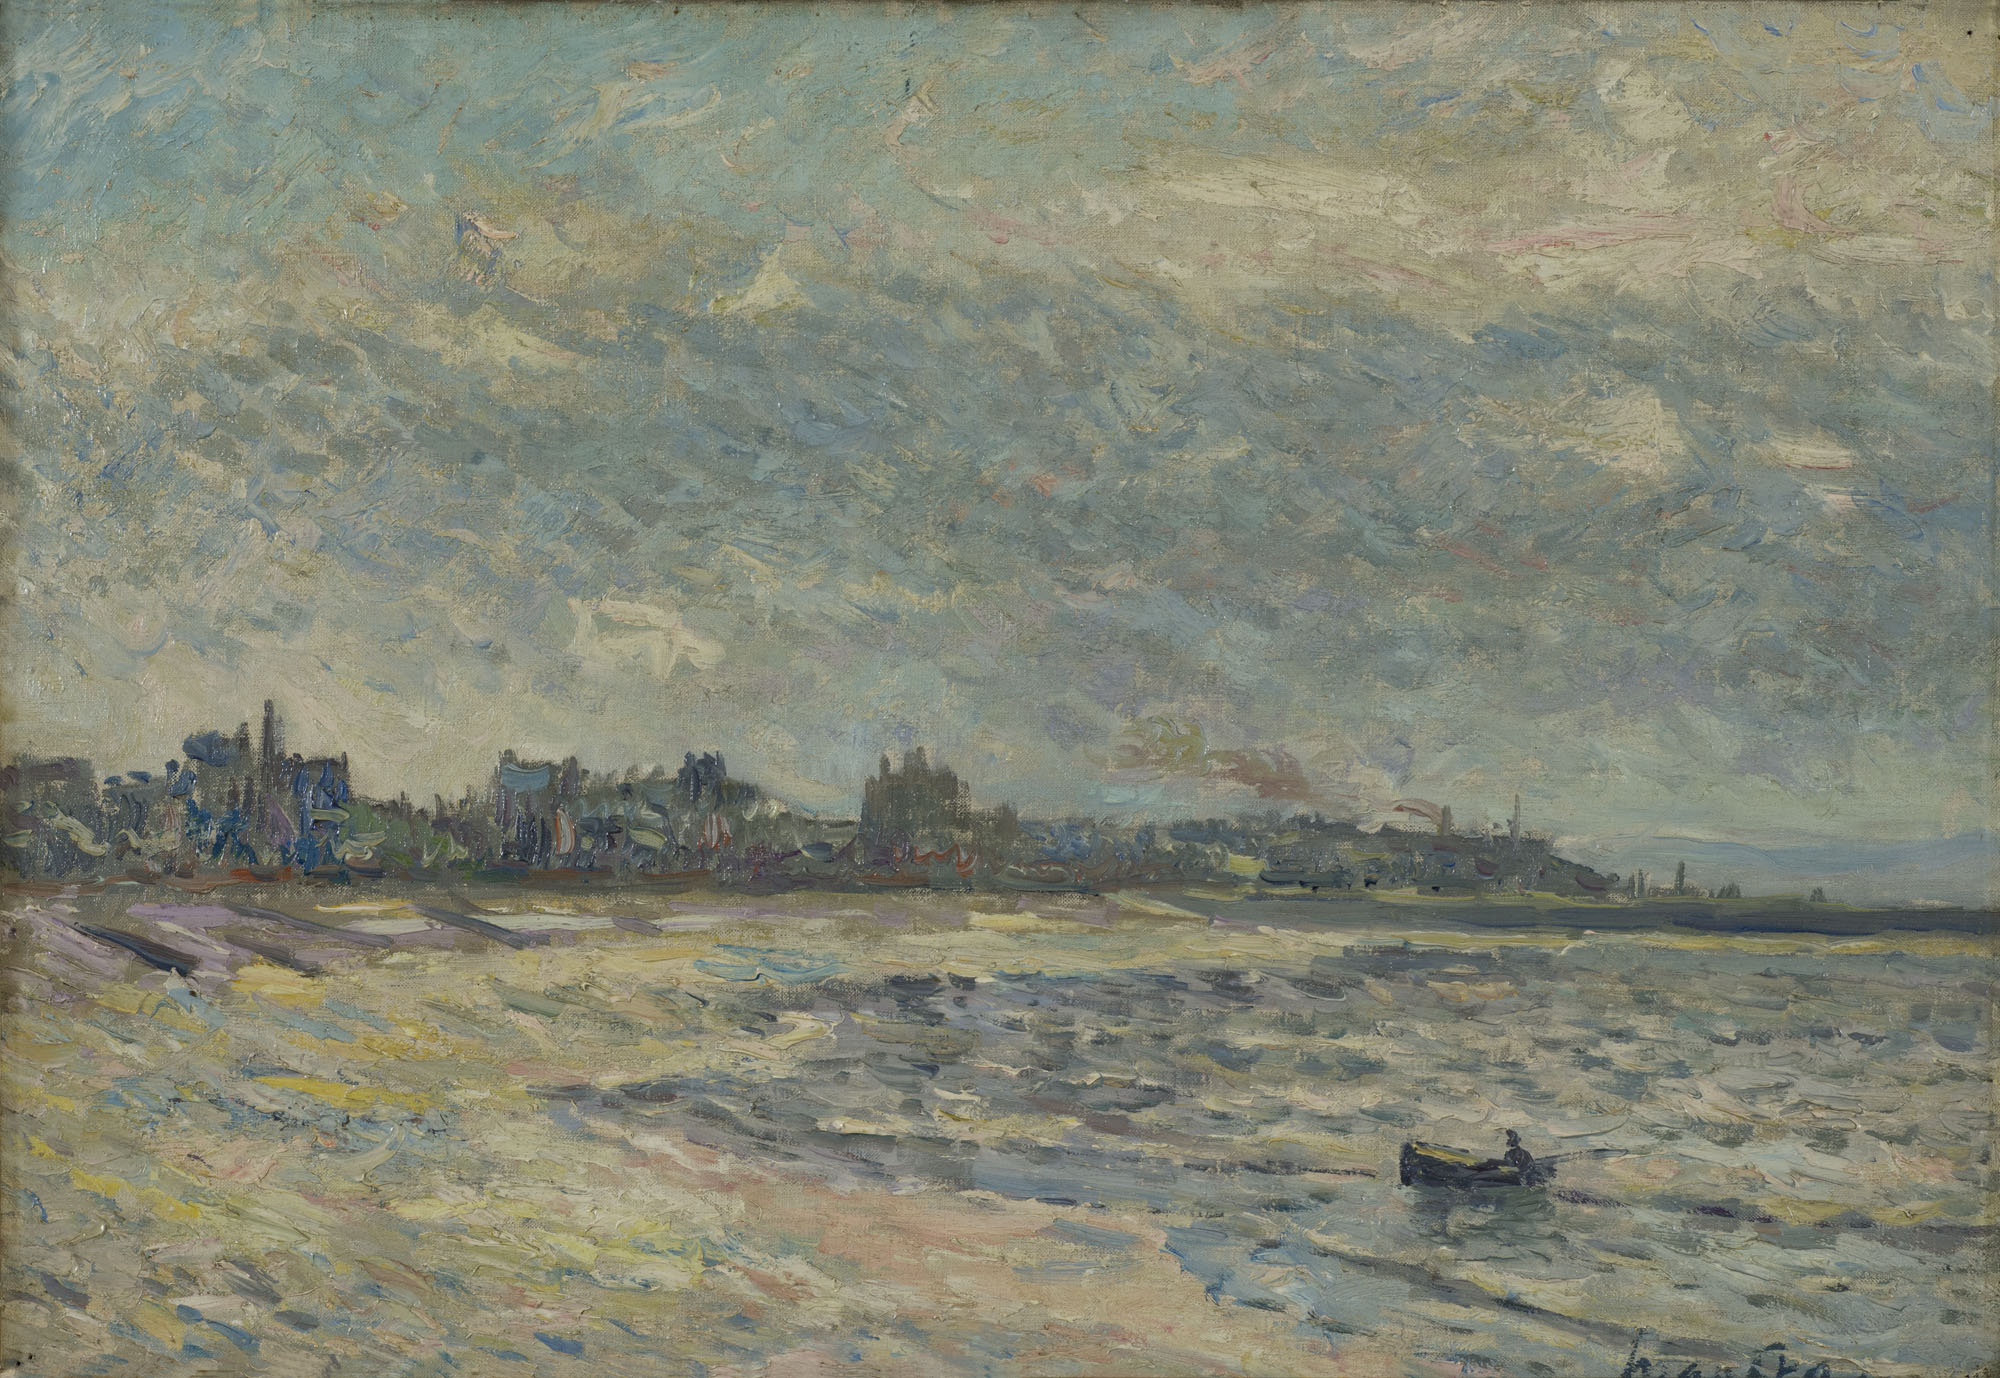 Tableau La Plage du Havre